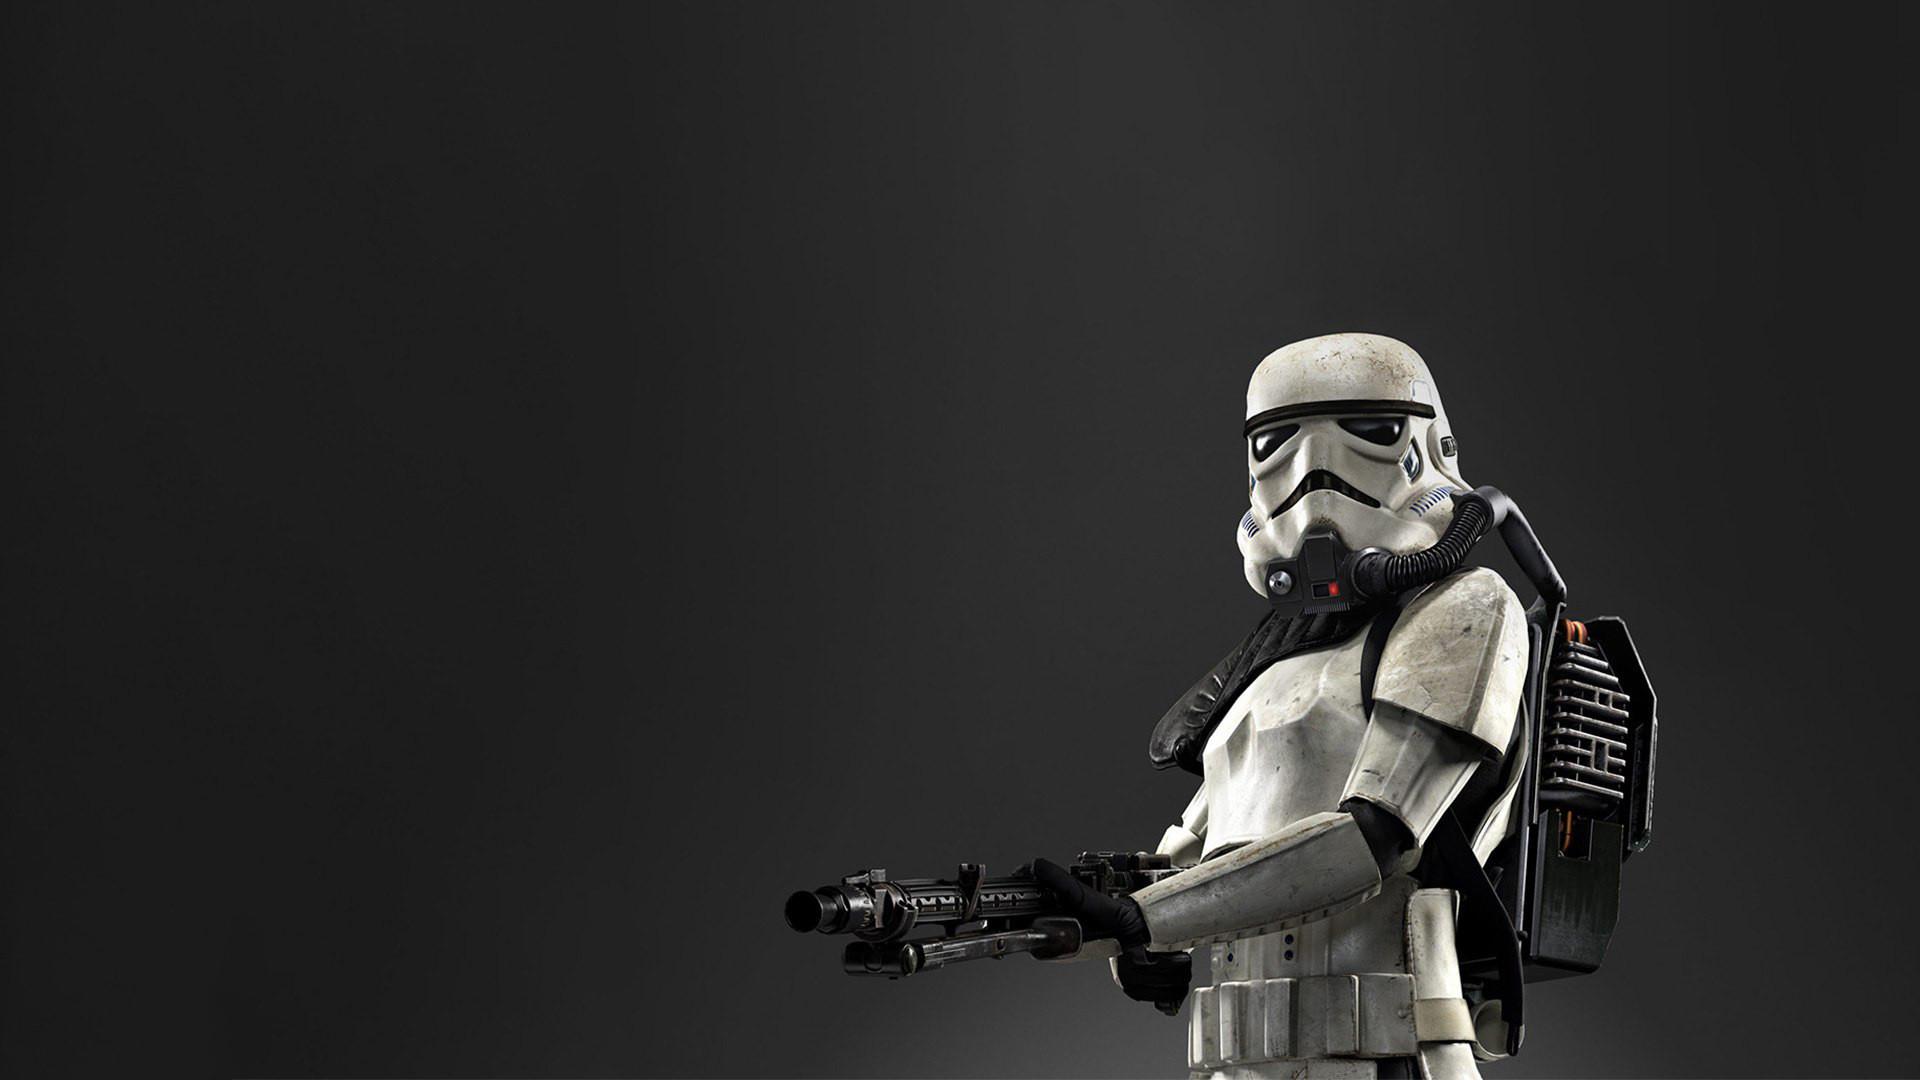 Res: 1920x1080, star wars stormtrooper wallpaper #574153